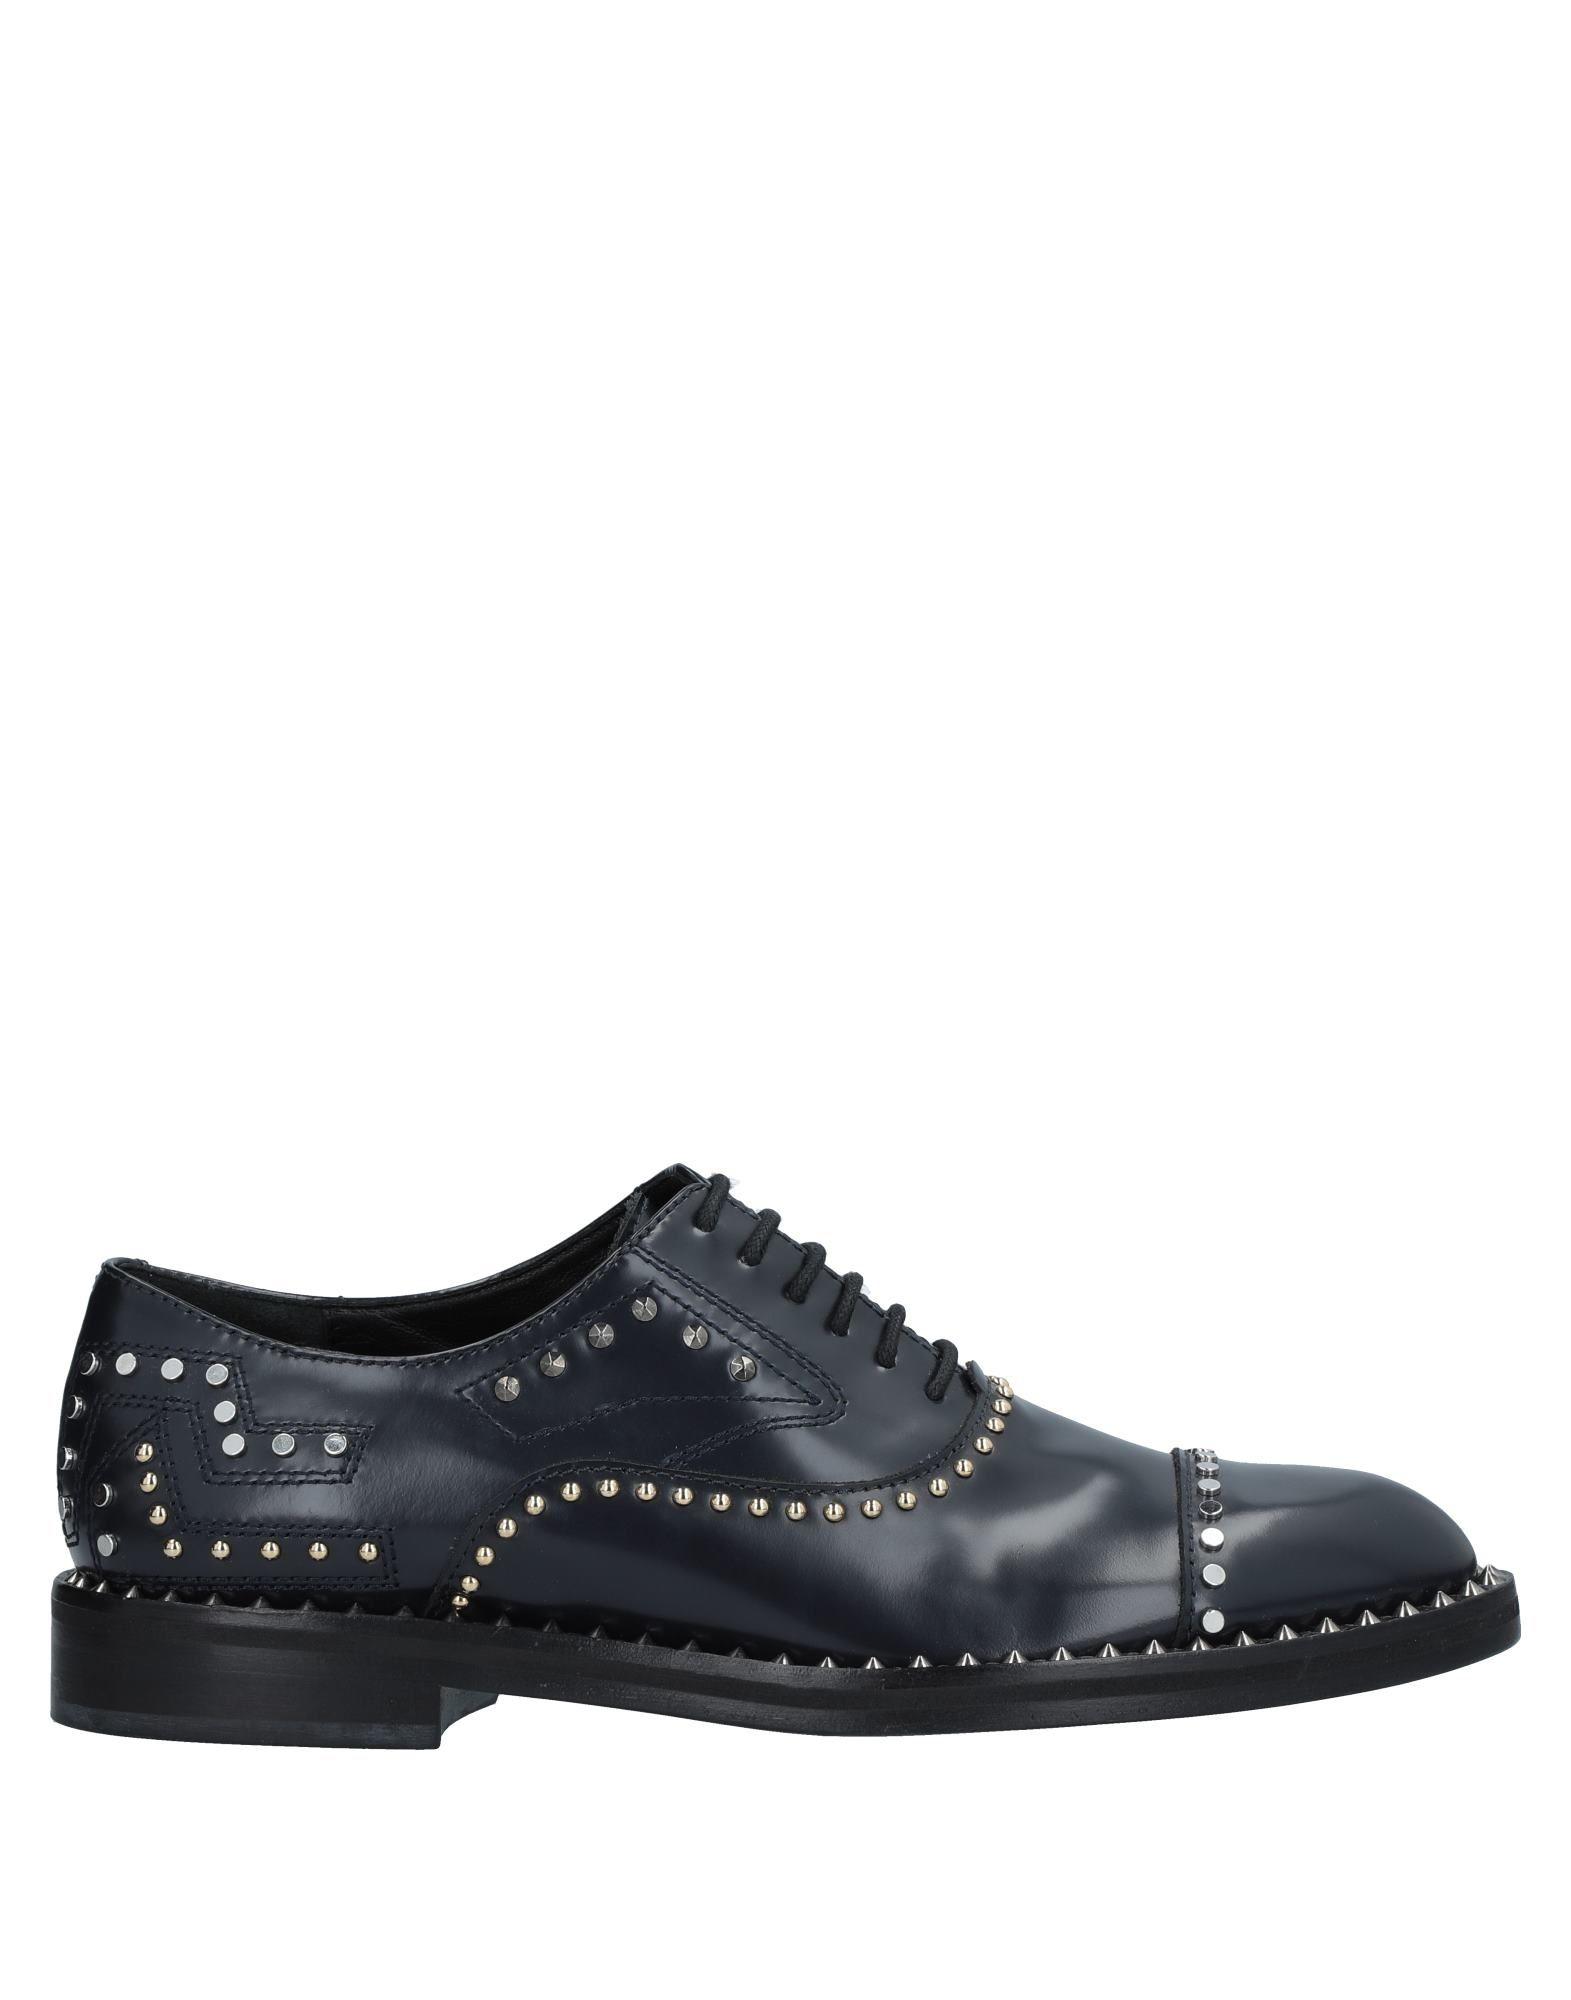 Rabatt Schuhe Damen Zadig & Voltaire Schnürschuhe Damen Schuhe  11525801IQ d8dca0